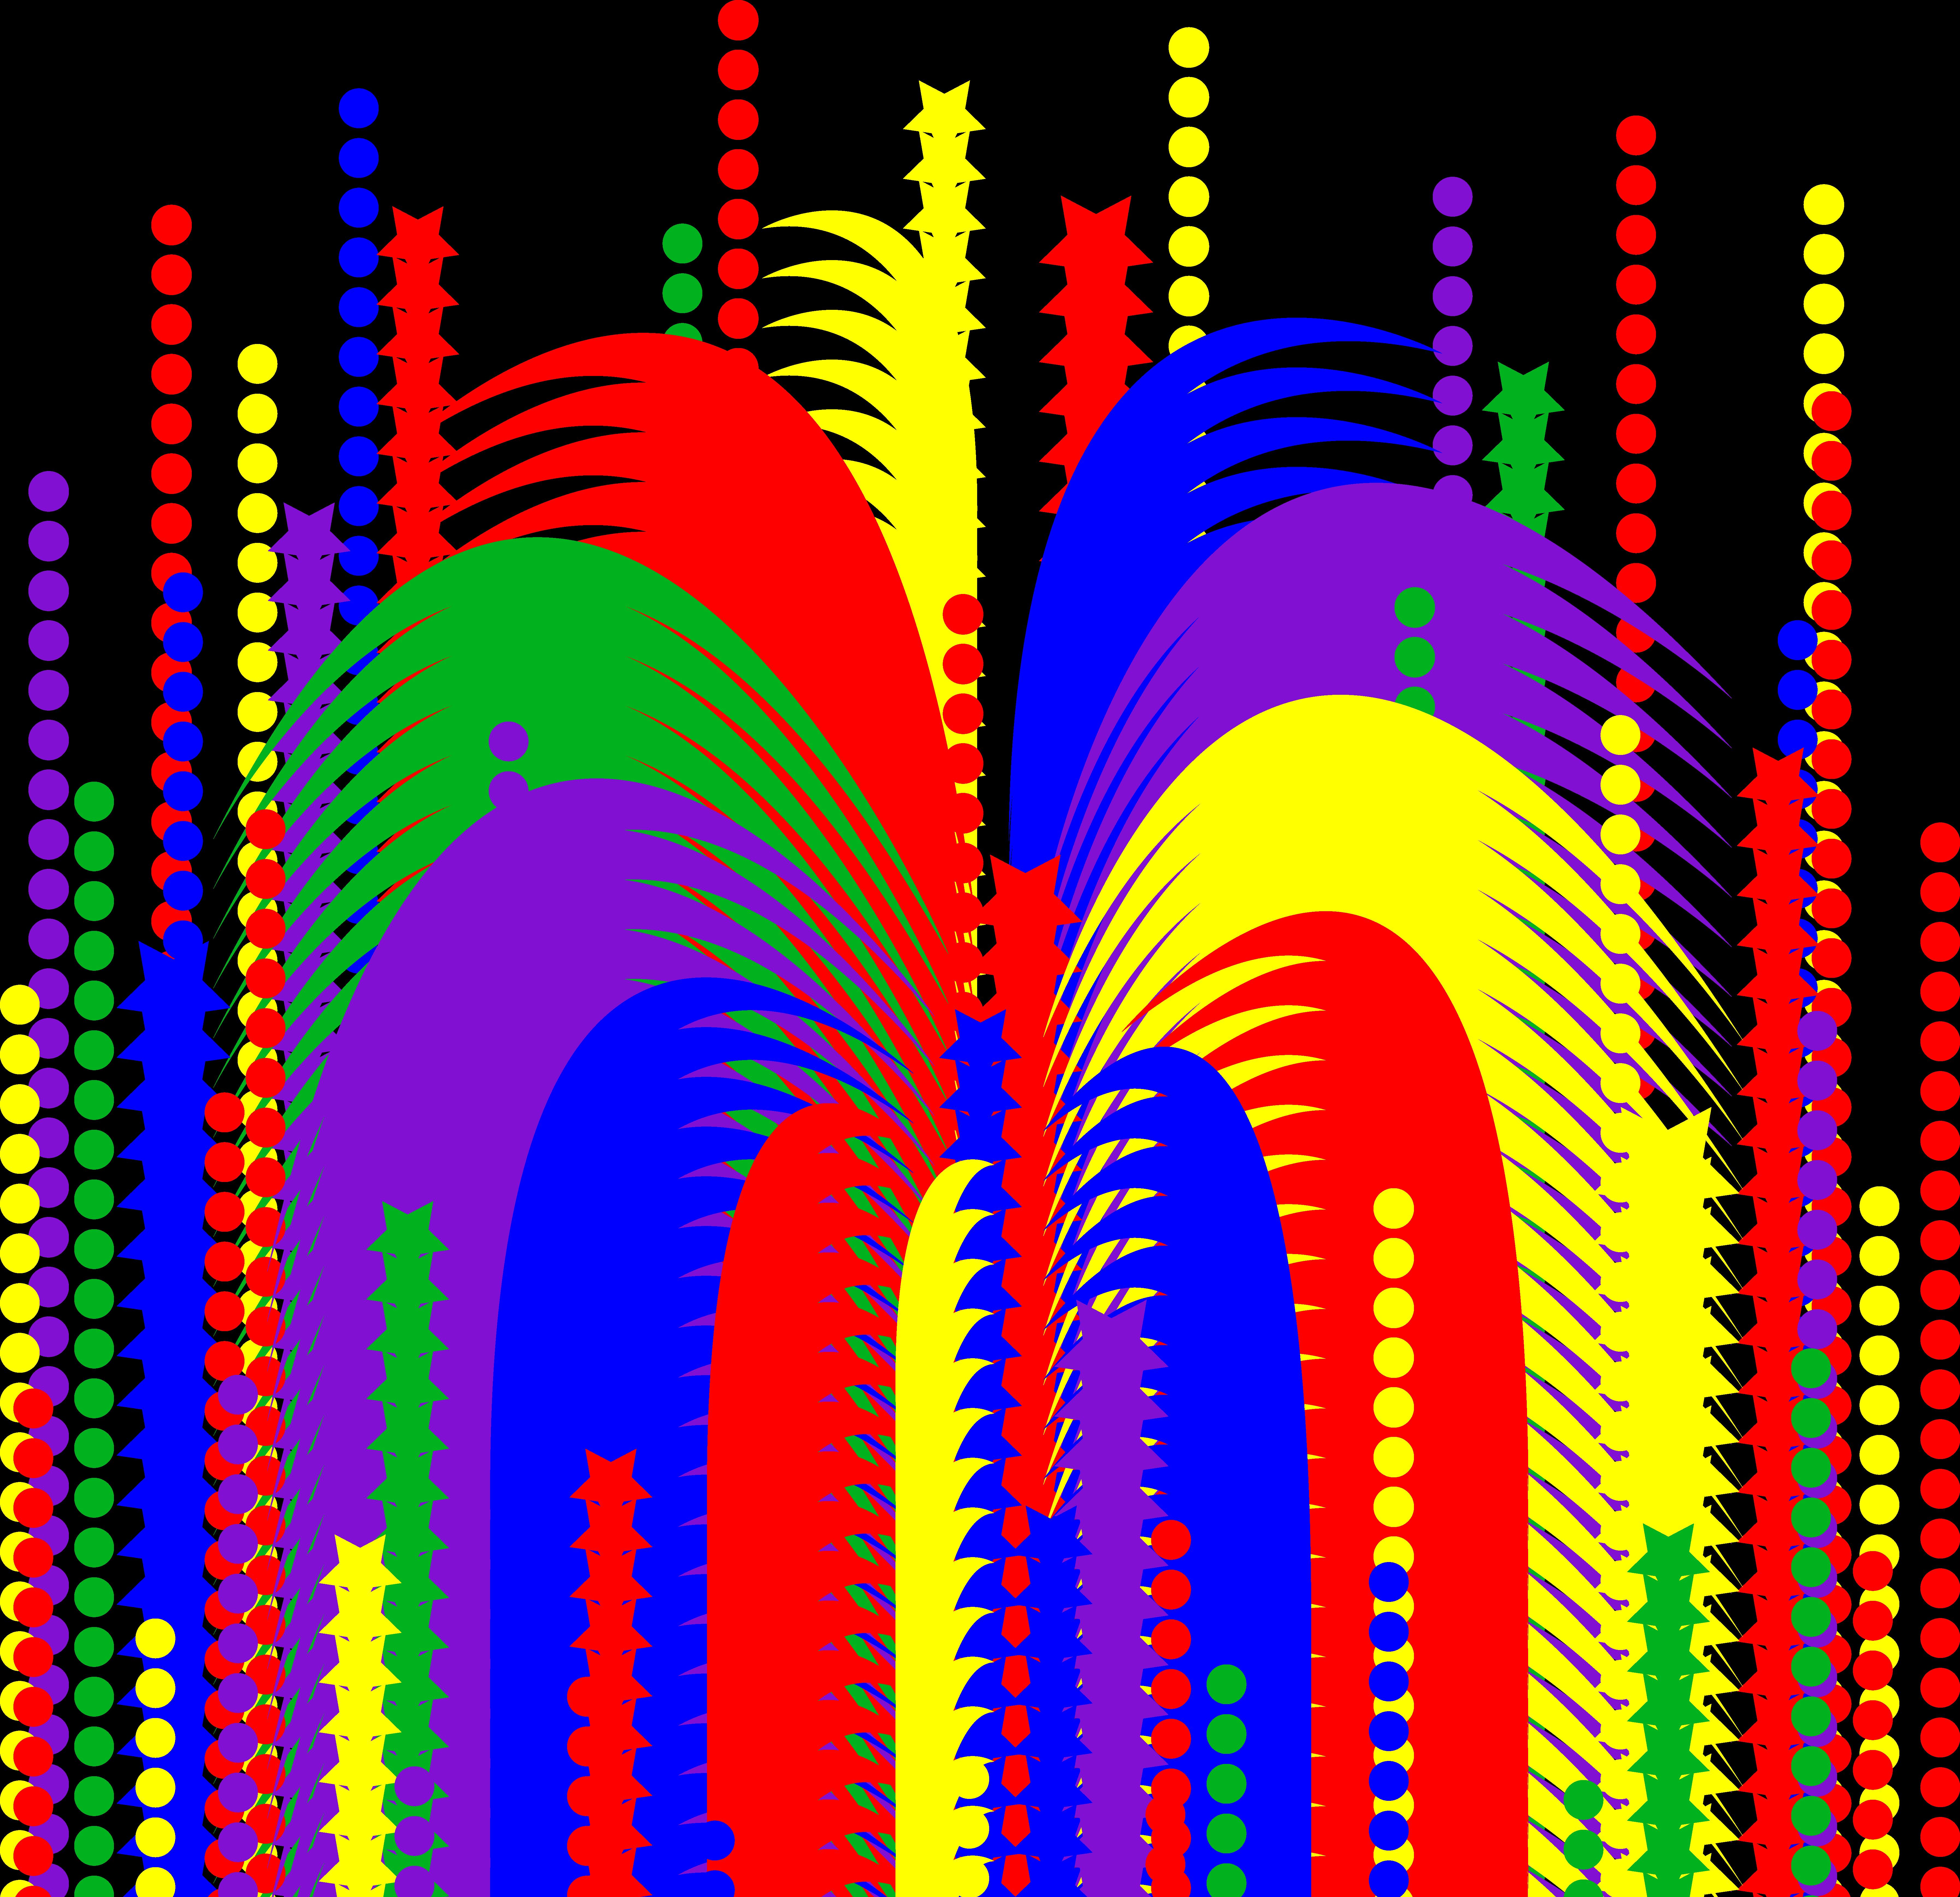 7175x6943 Fireworks Clipart 3